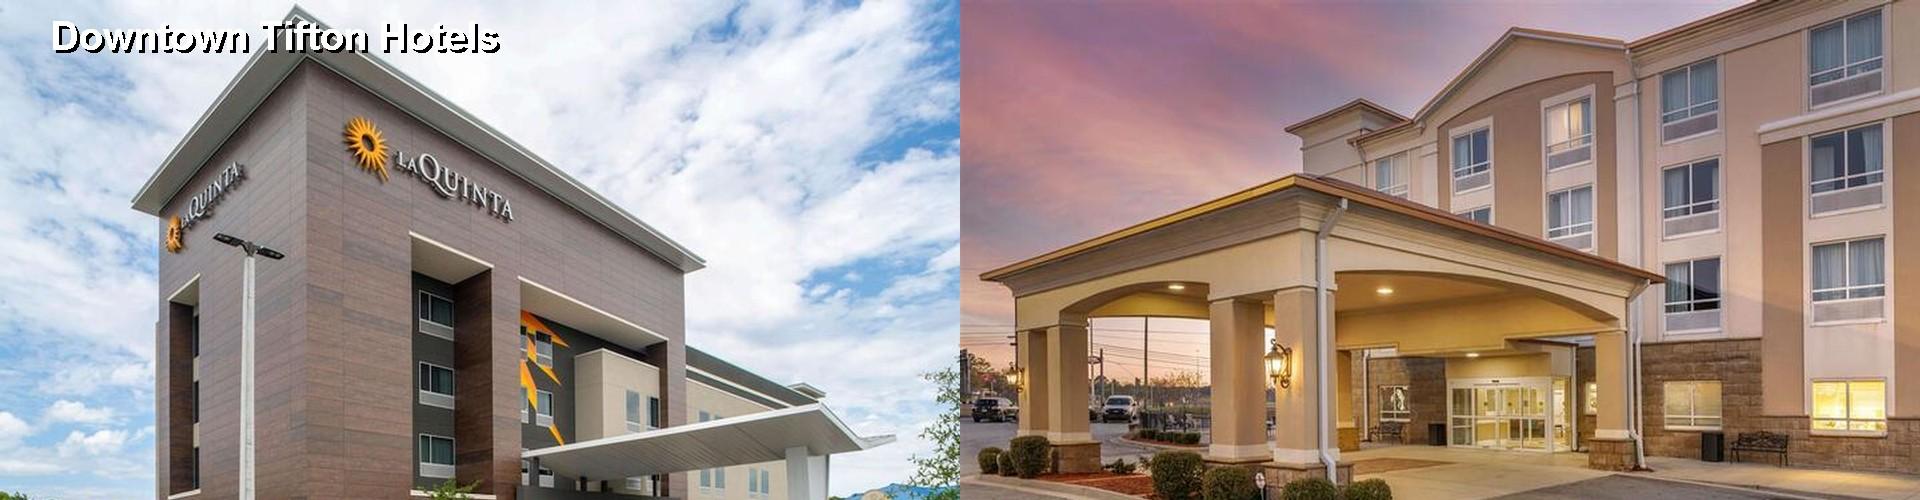 5 Best Hotels Near Downtown Tifton